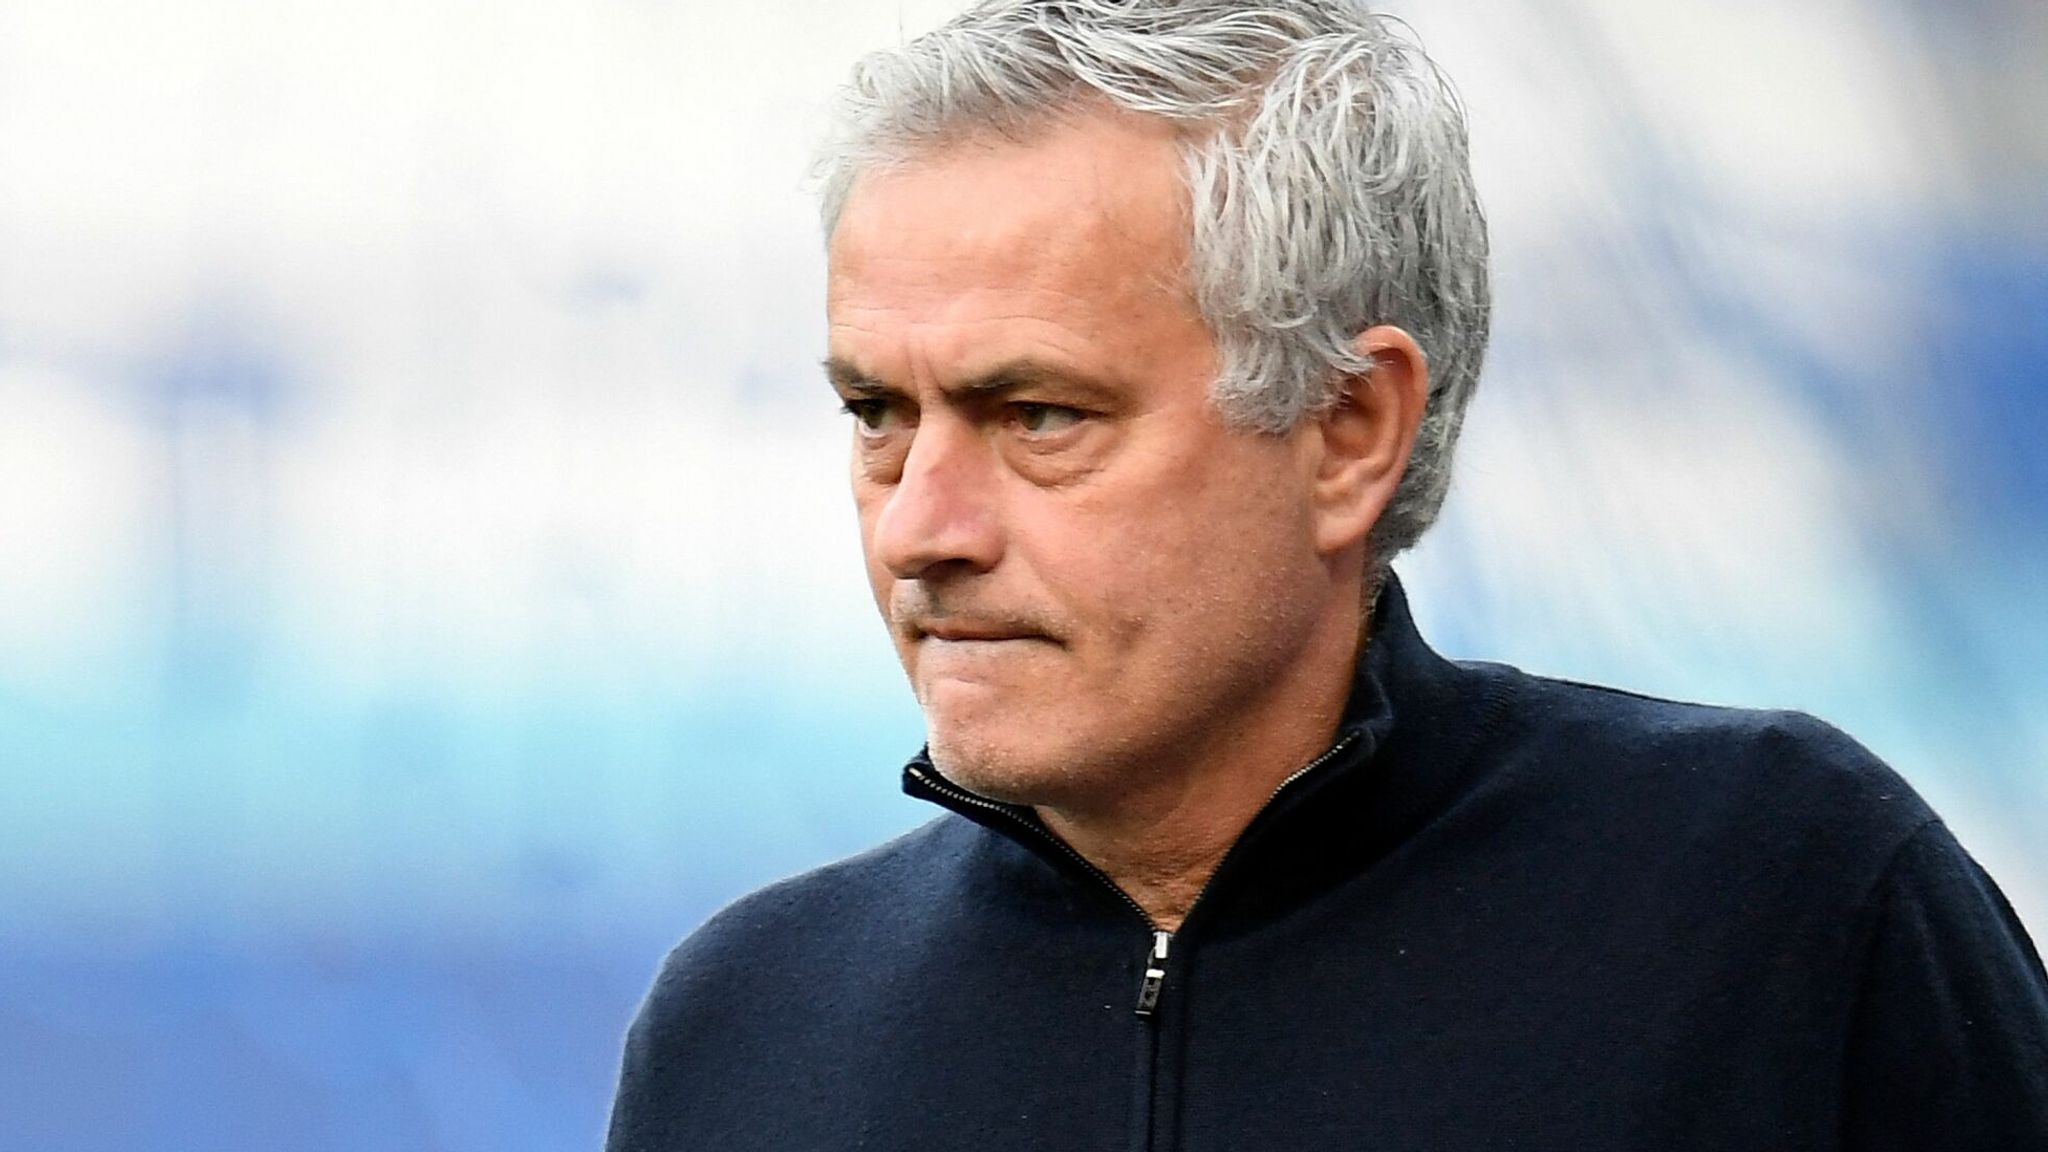 Jose Mourinho appointed Roma head coach for next season | Football News